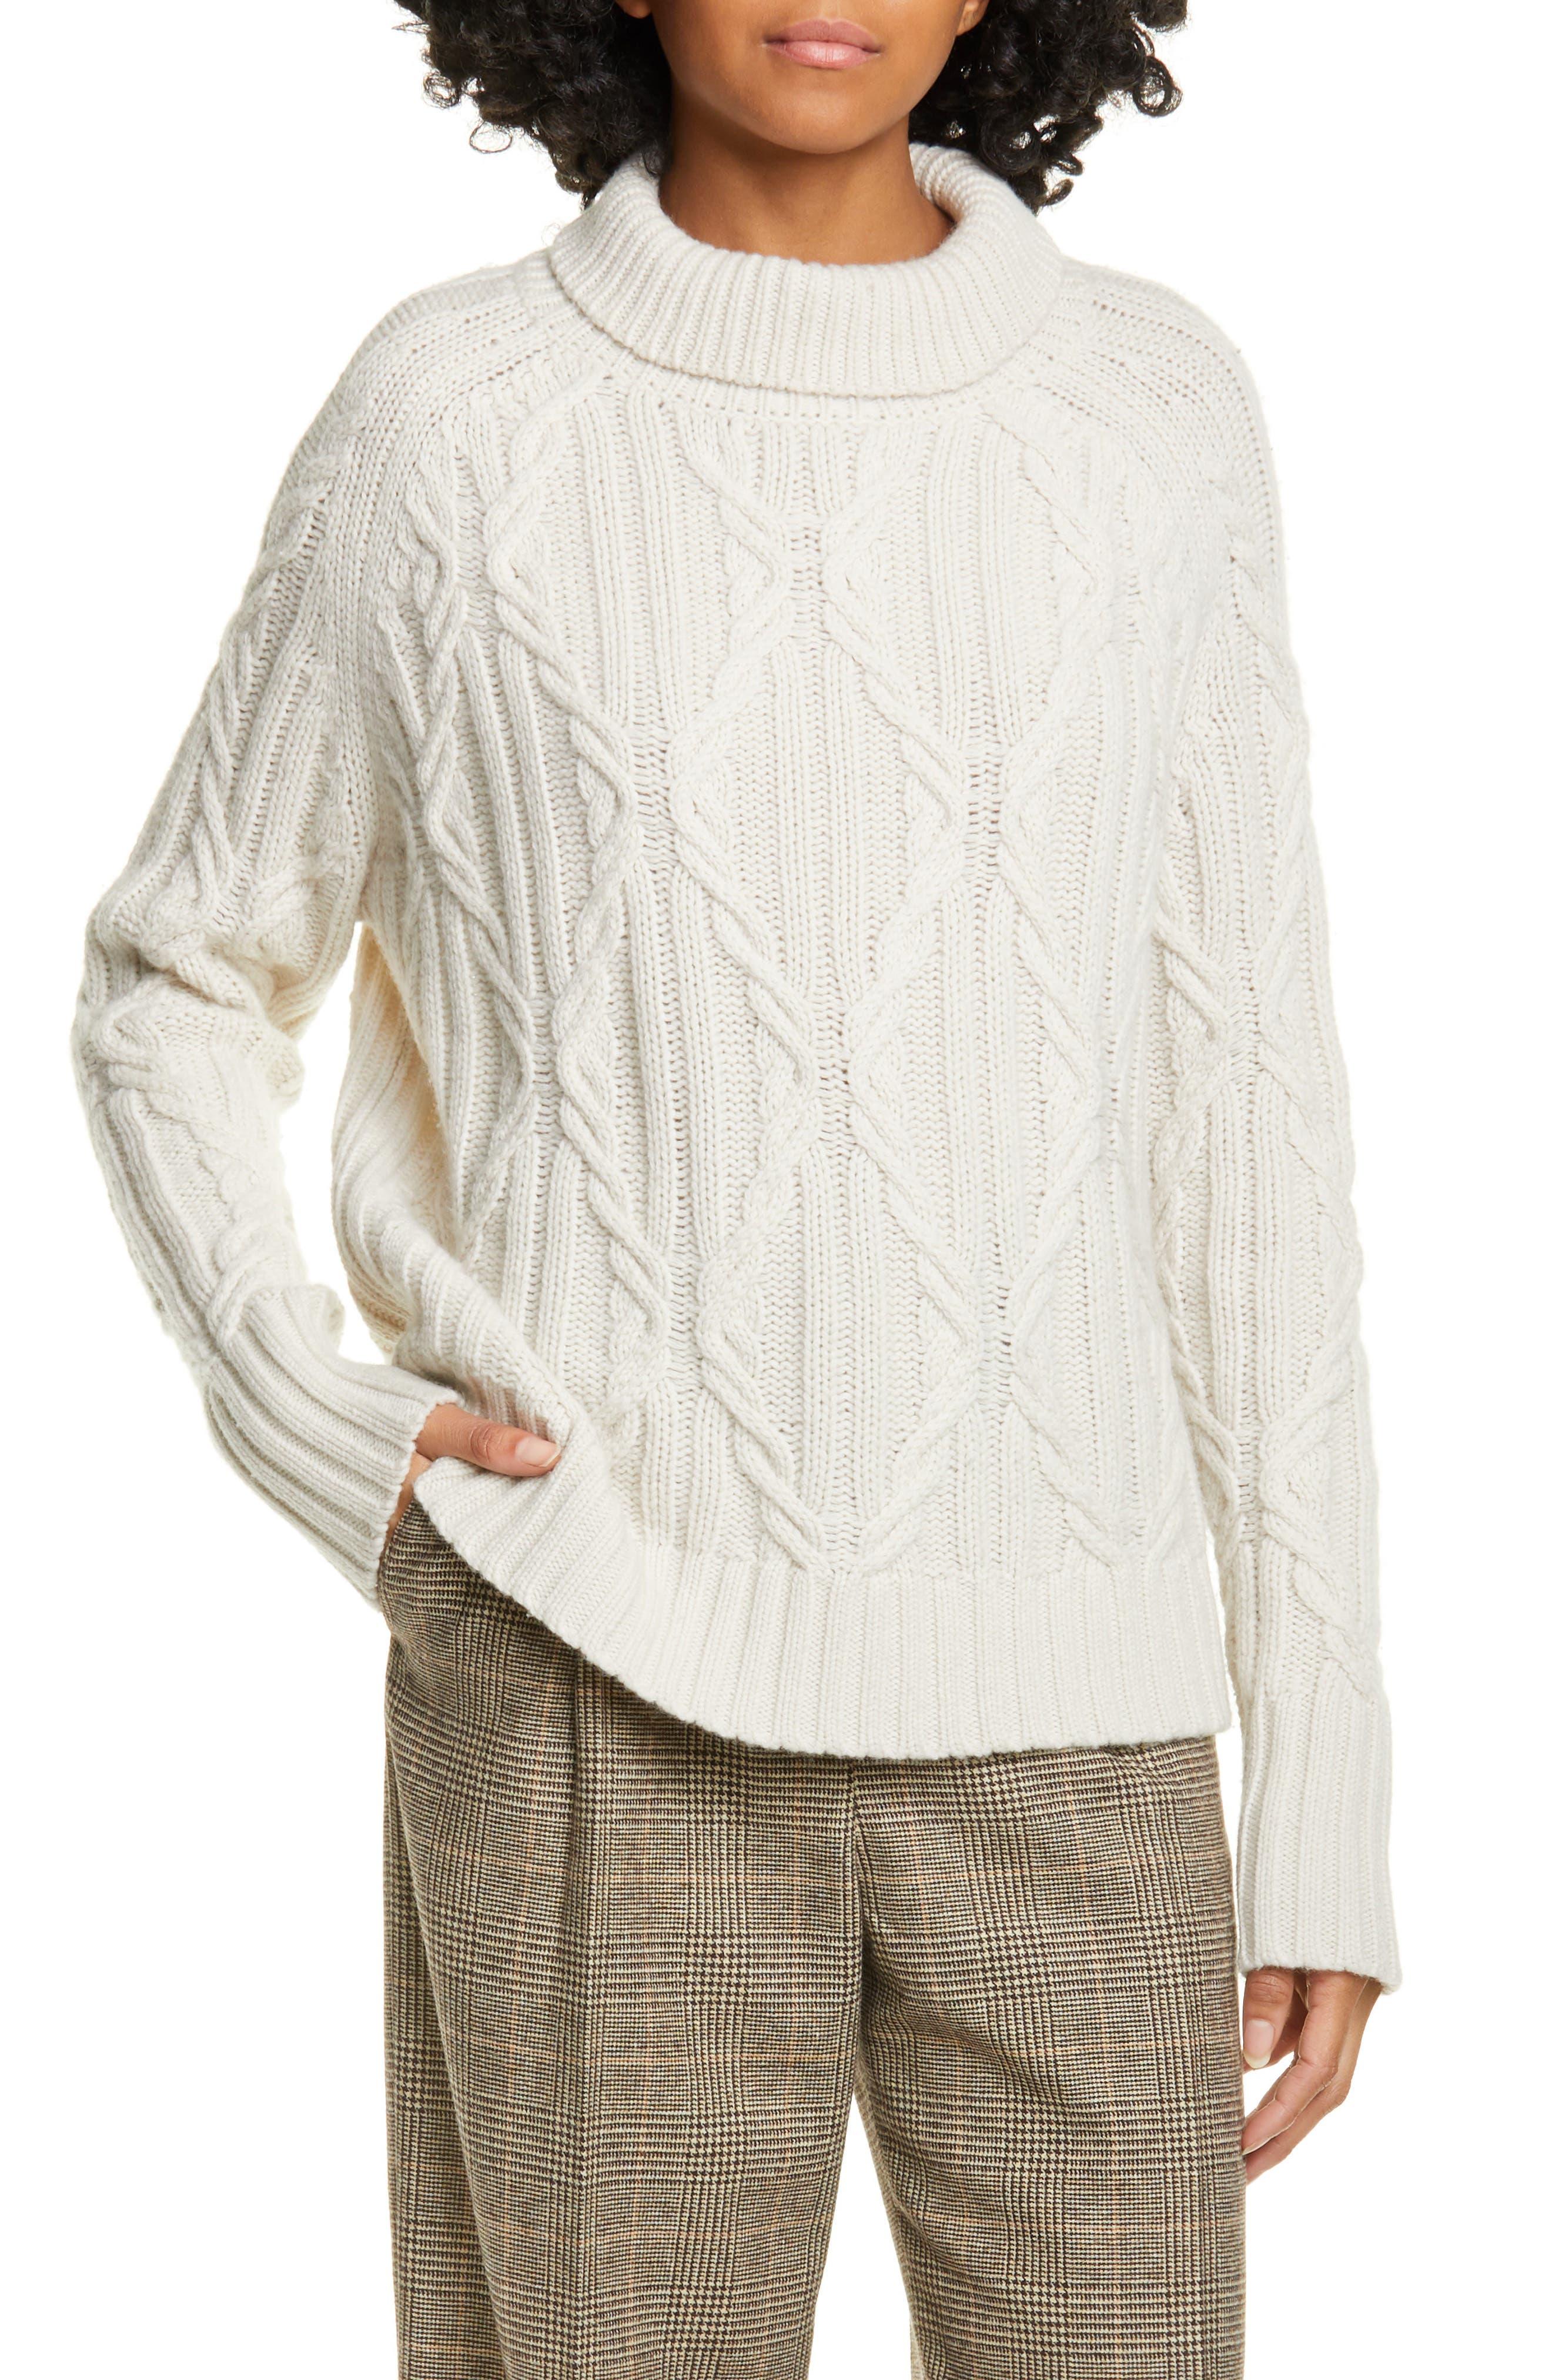 Nili Lotan Knitwear Meyra Mock Neck Cable Knit Cashmere Sweater